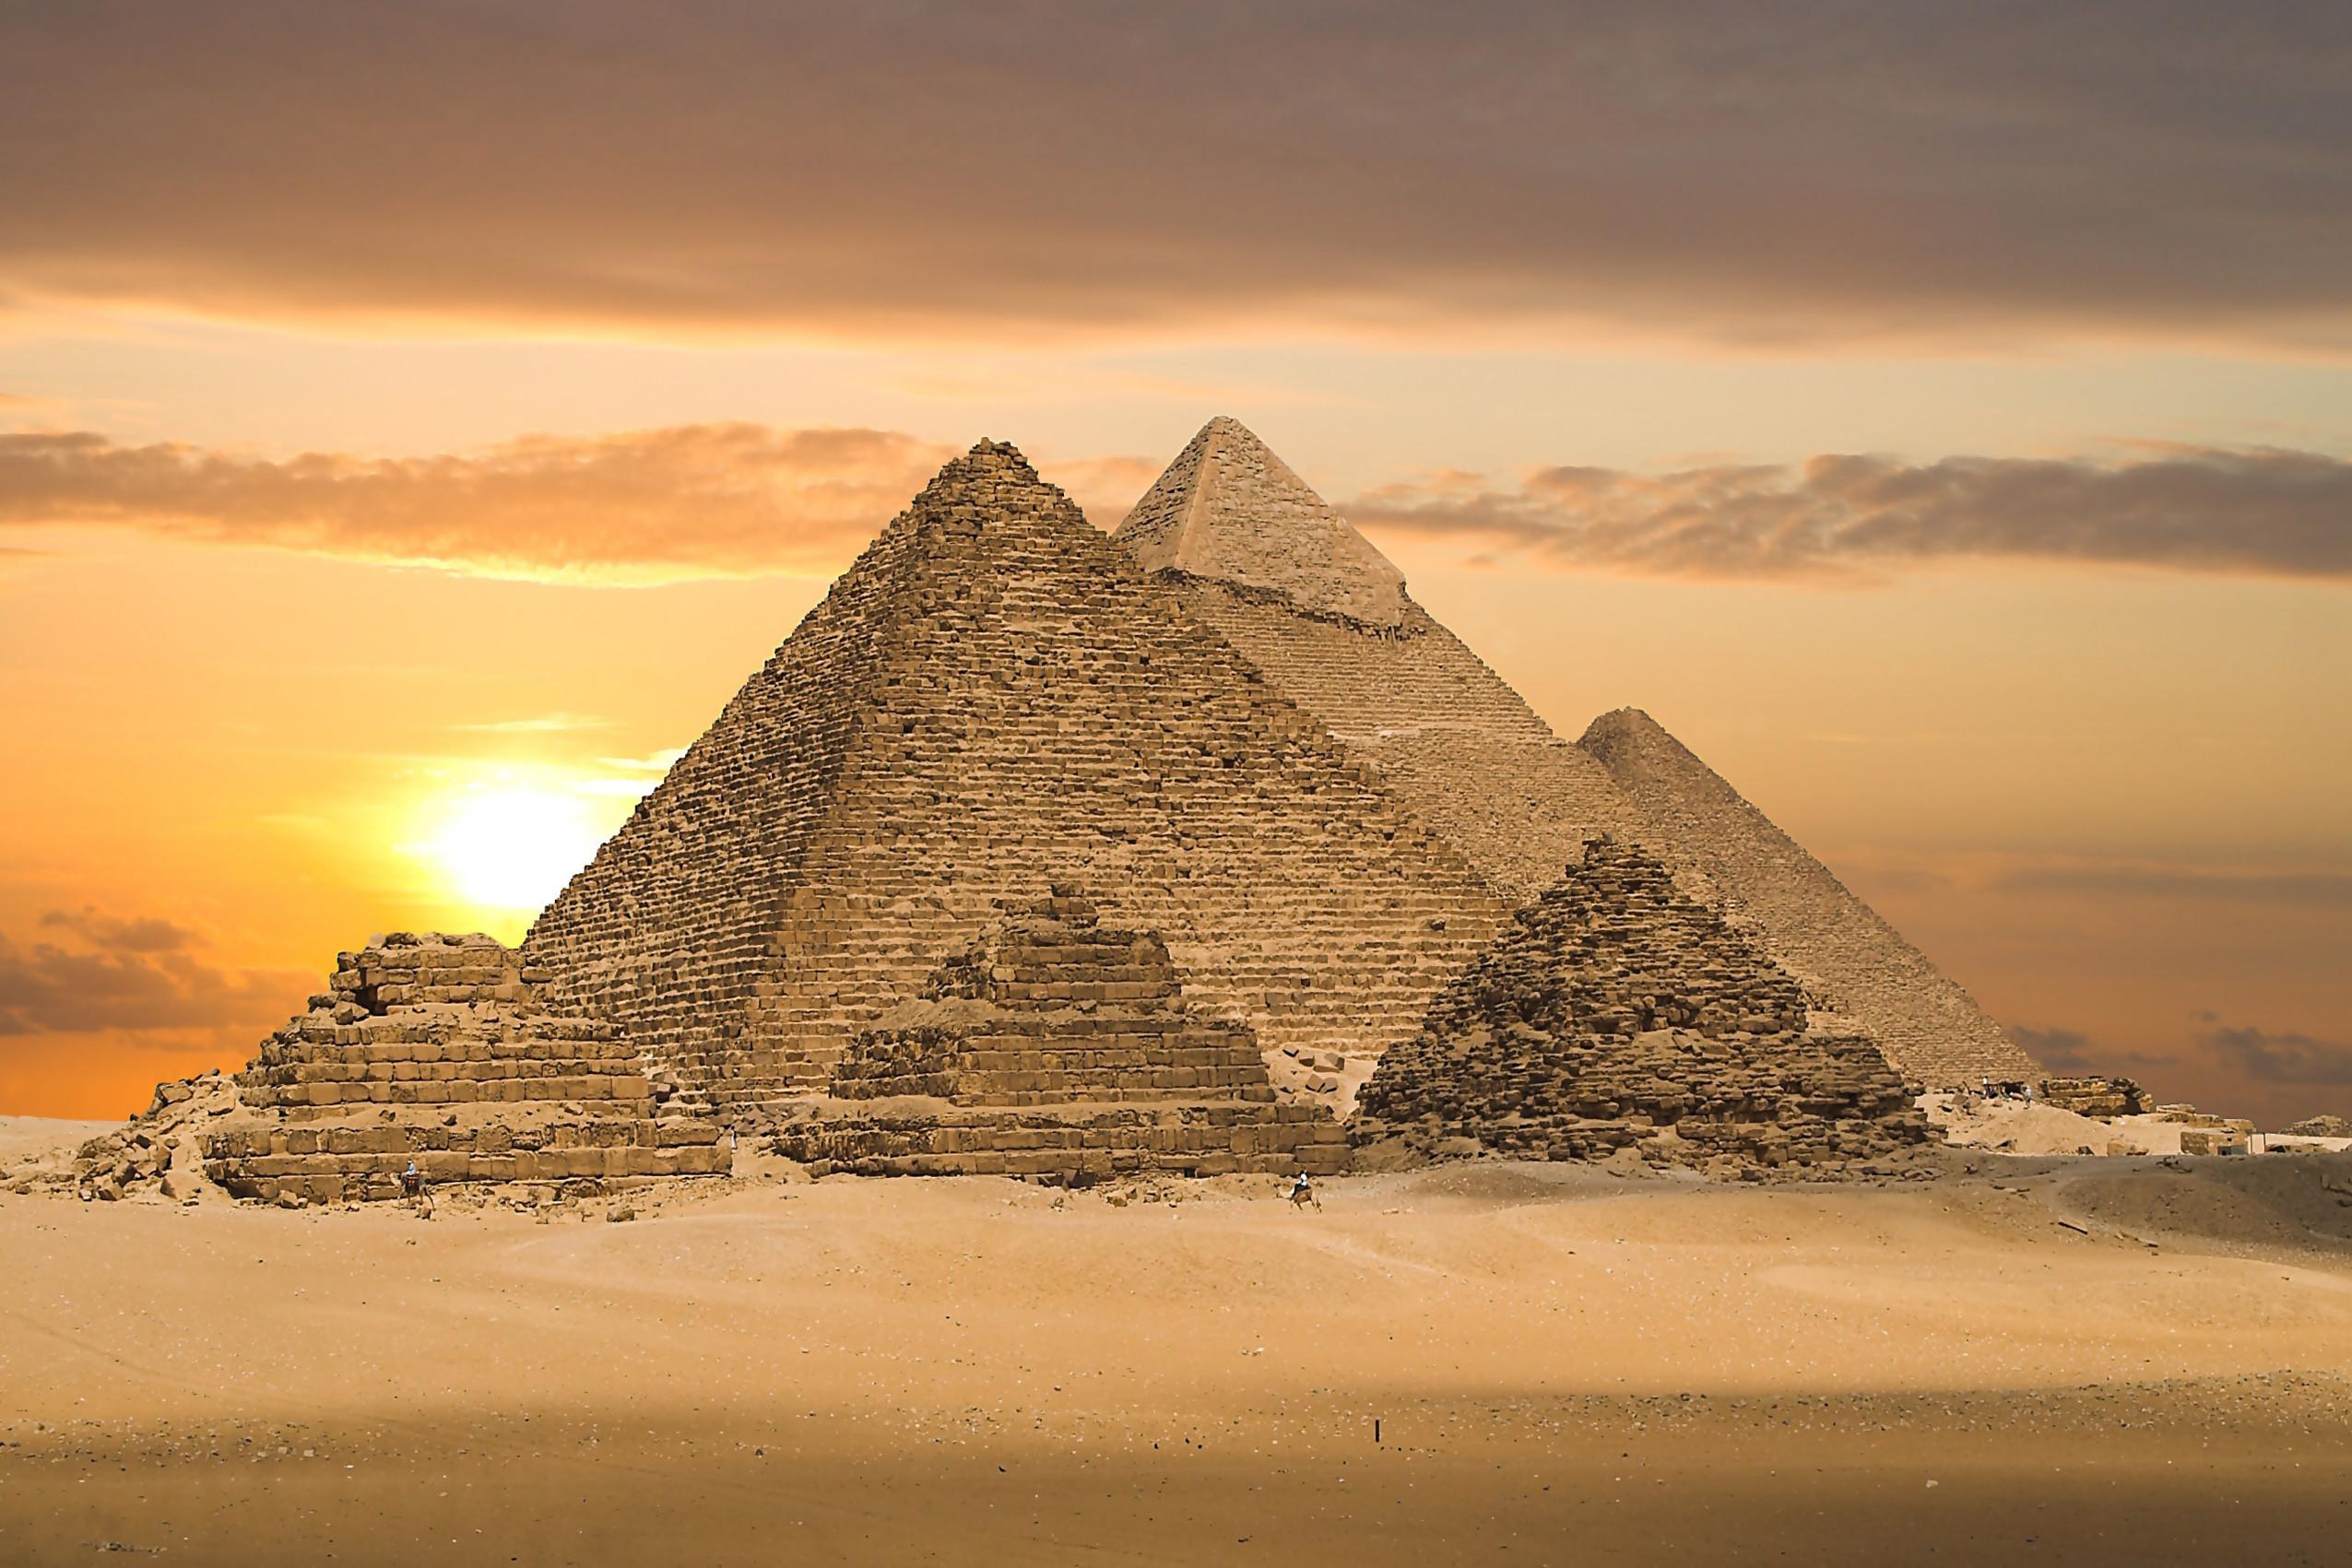 pyramids of egypt ancient building wallpaper KC878 living room home wall  modern art decor wood frame